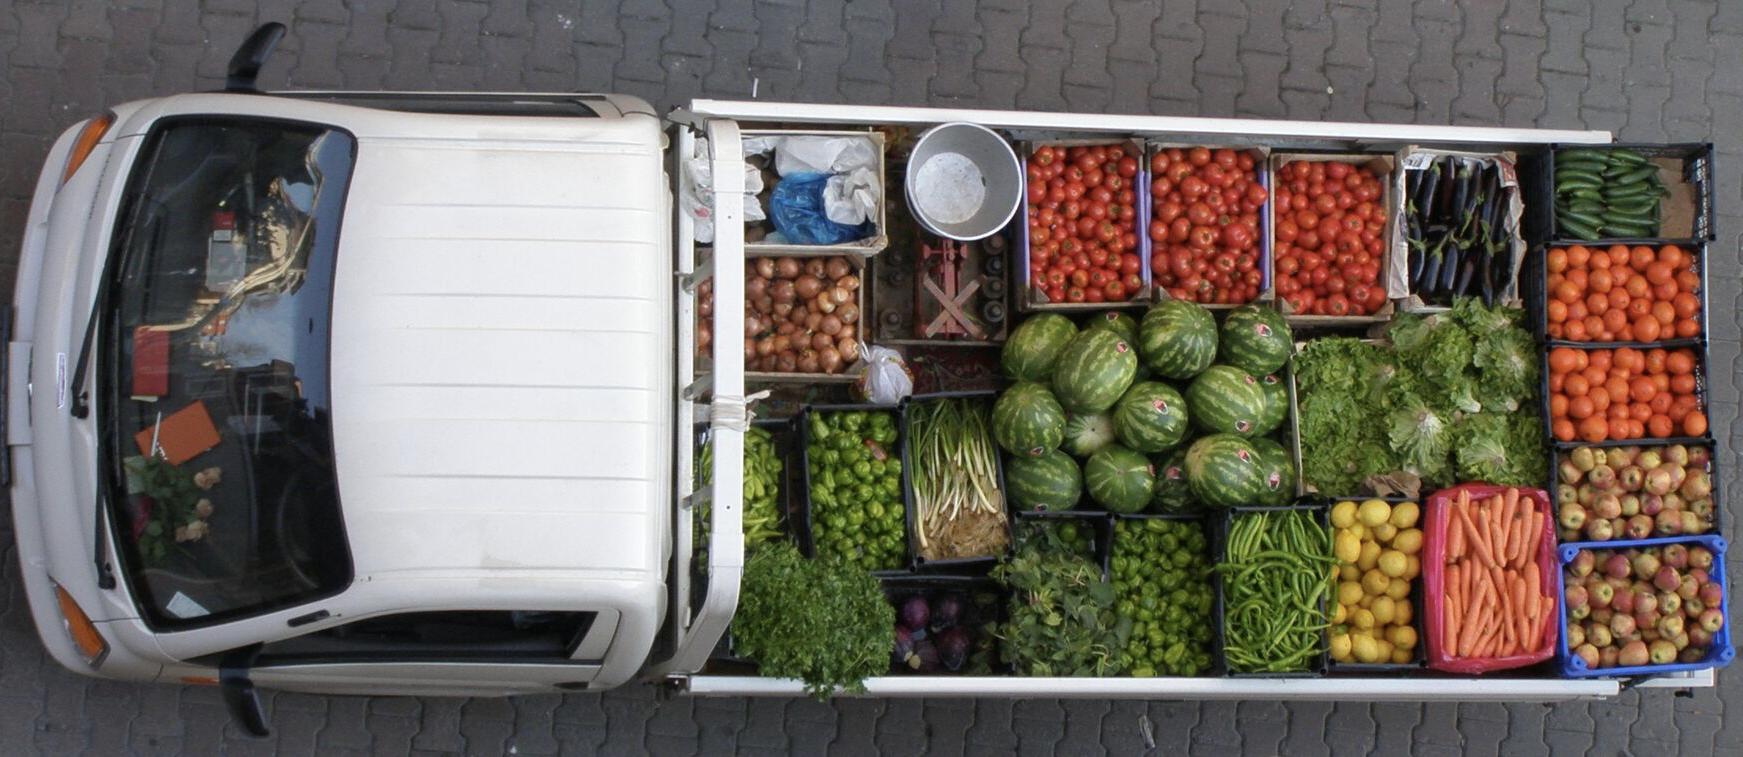 картинки машина с овощами присутствии пациента